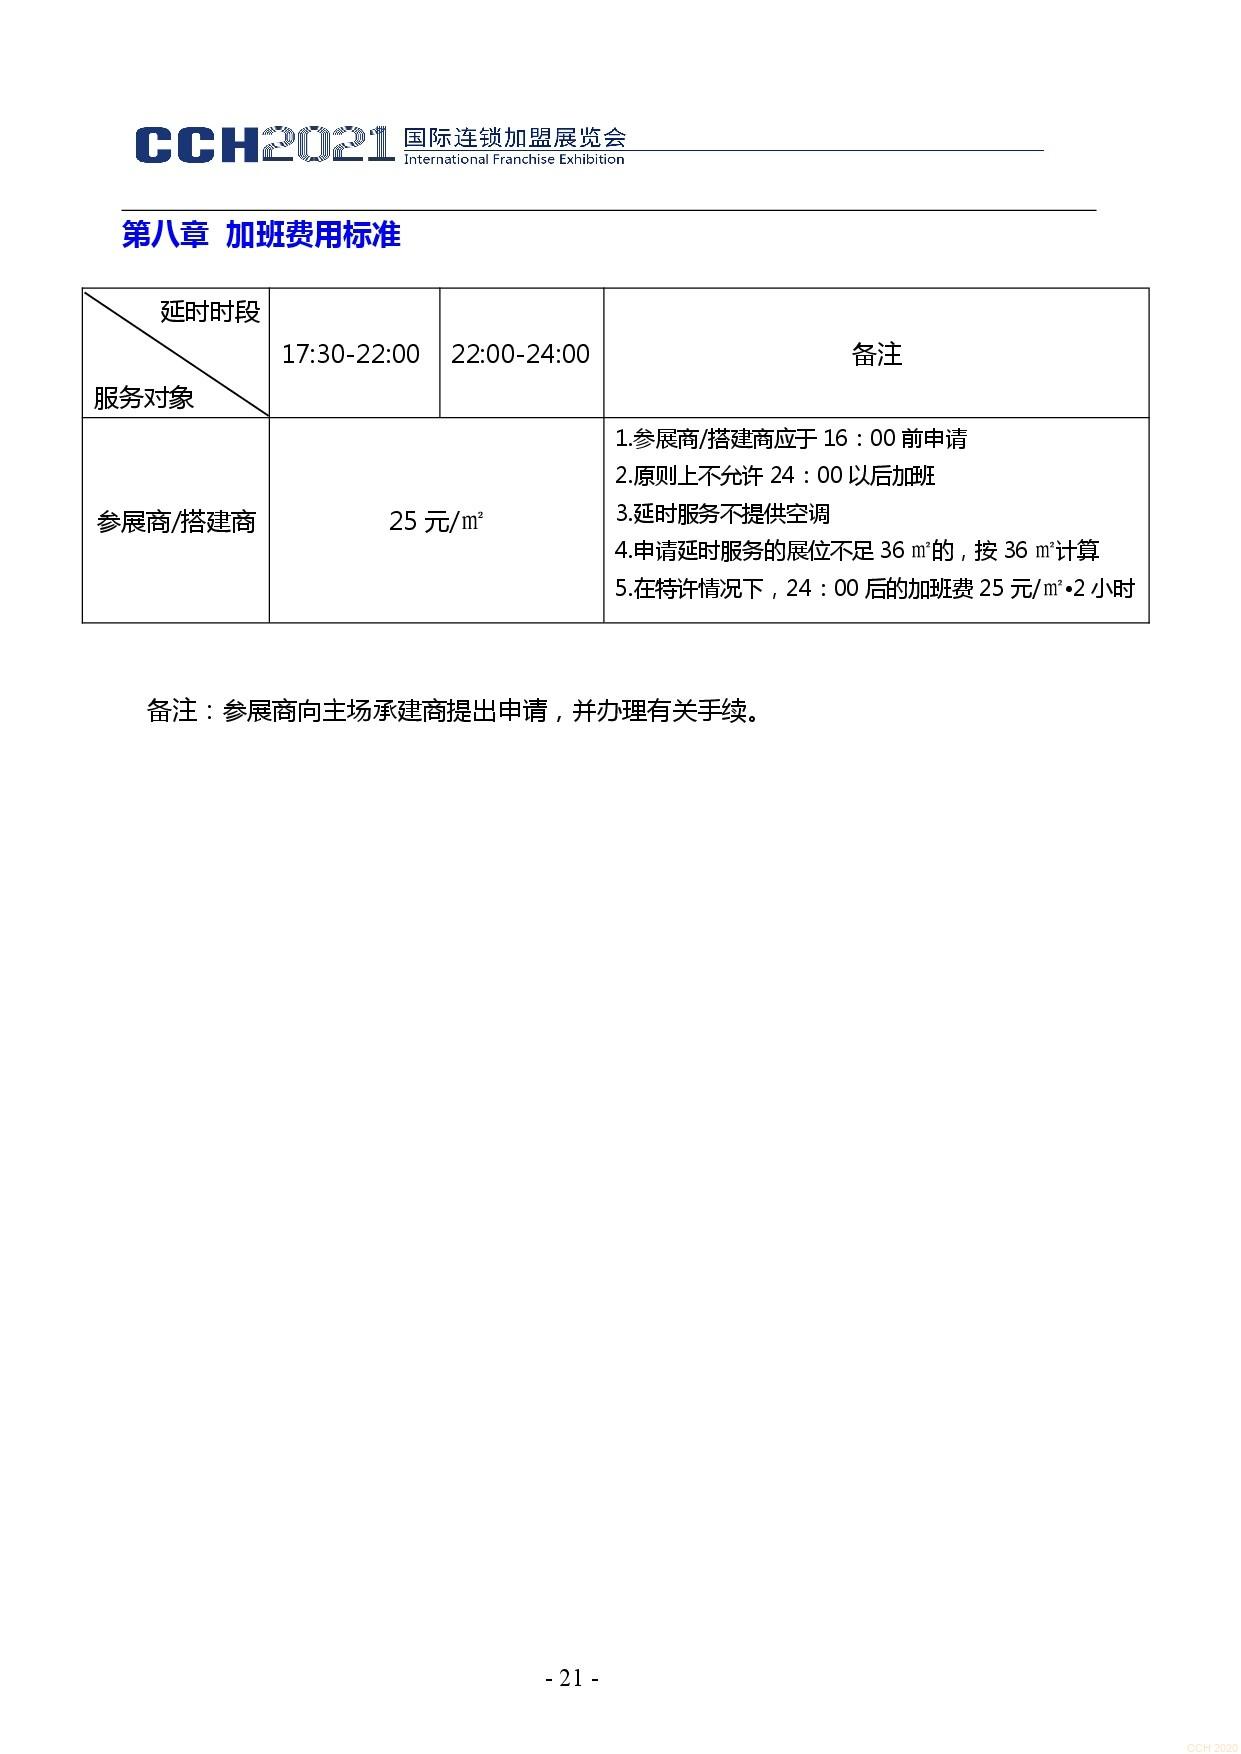 0416CCH深圳展参展商手册4.16-021.jpg